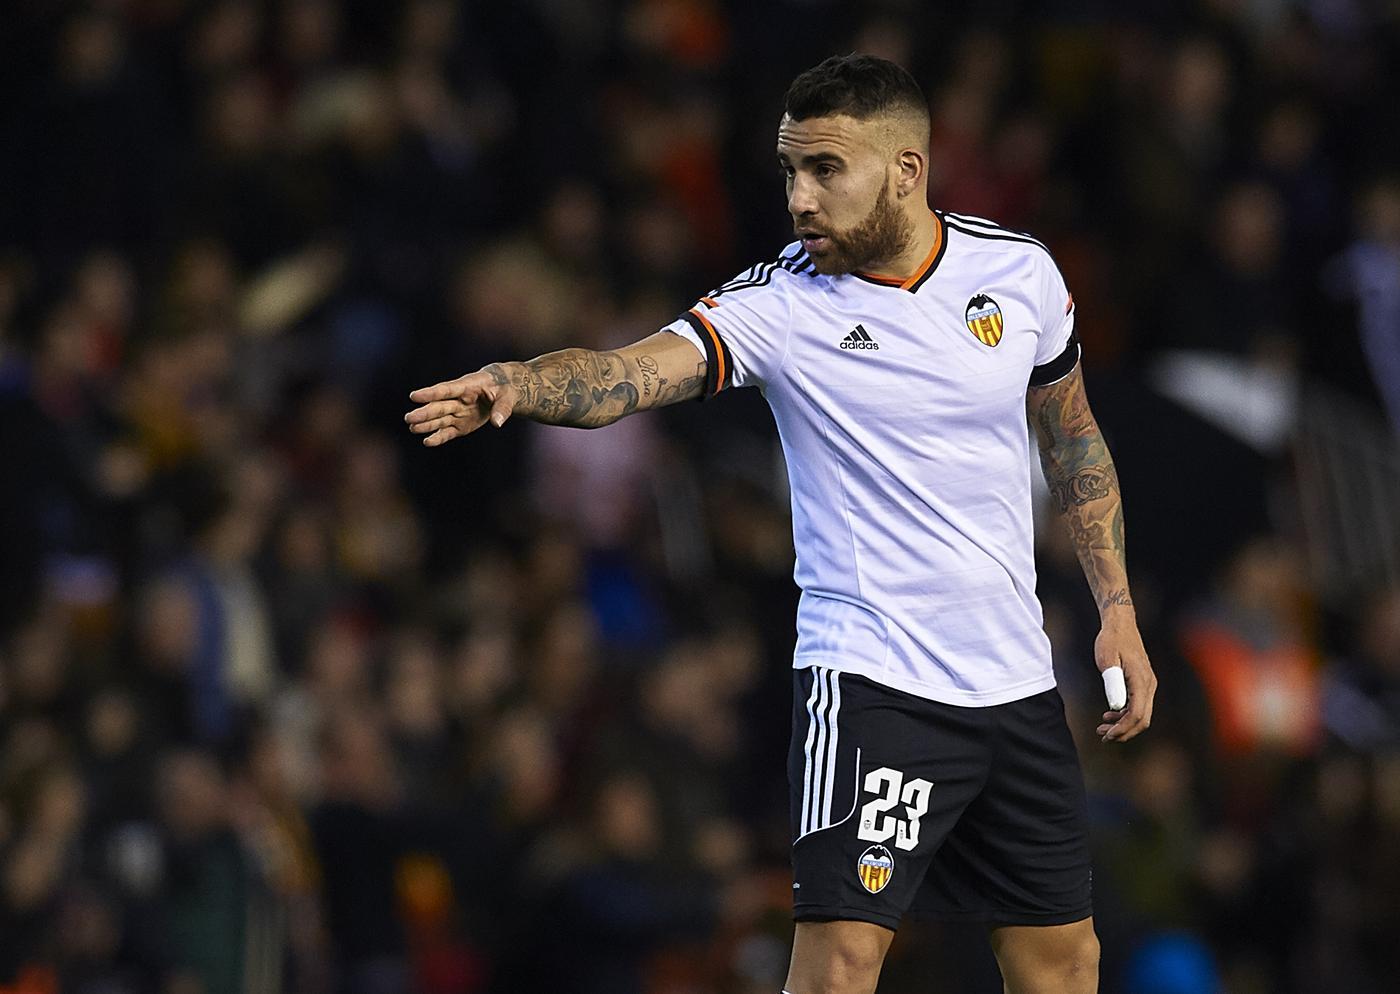 Manchester United transfer target Nicolas Otamendi 'wants to leave Valencia', reveals agent